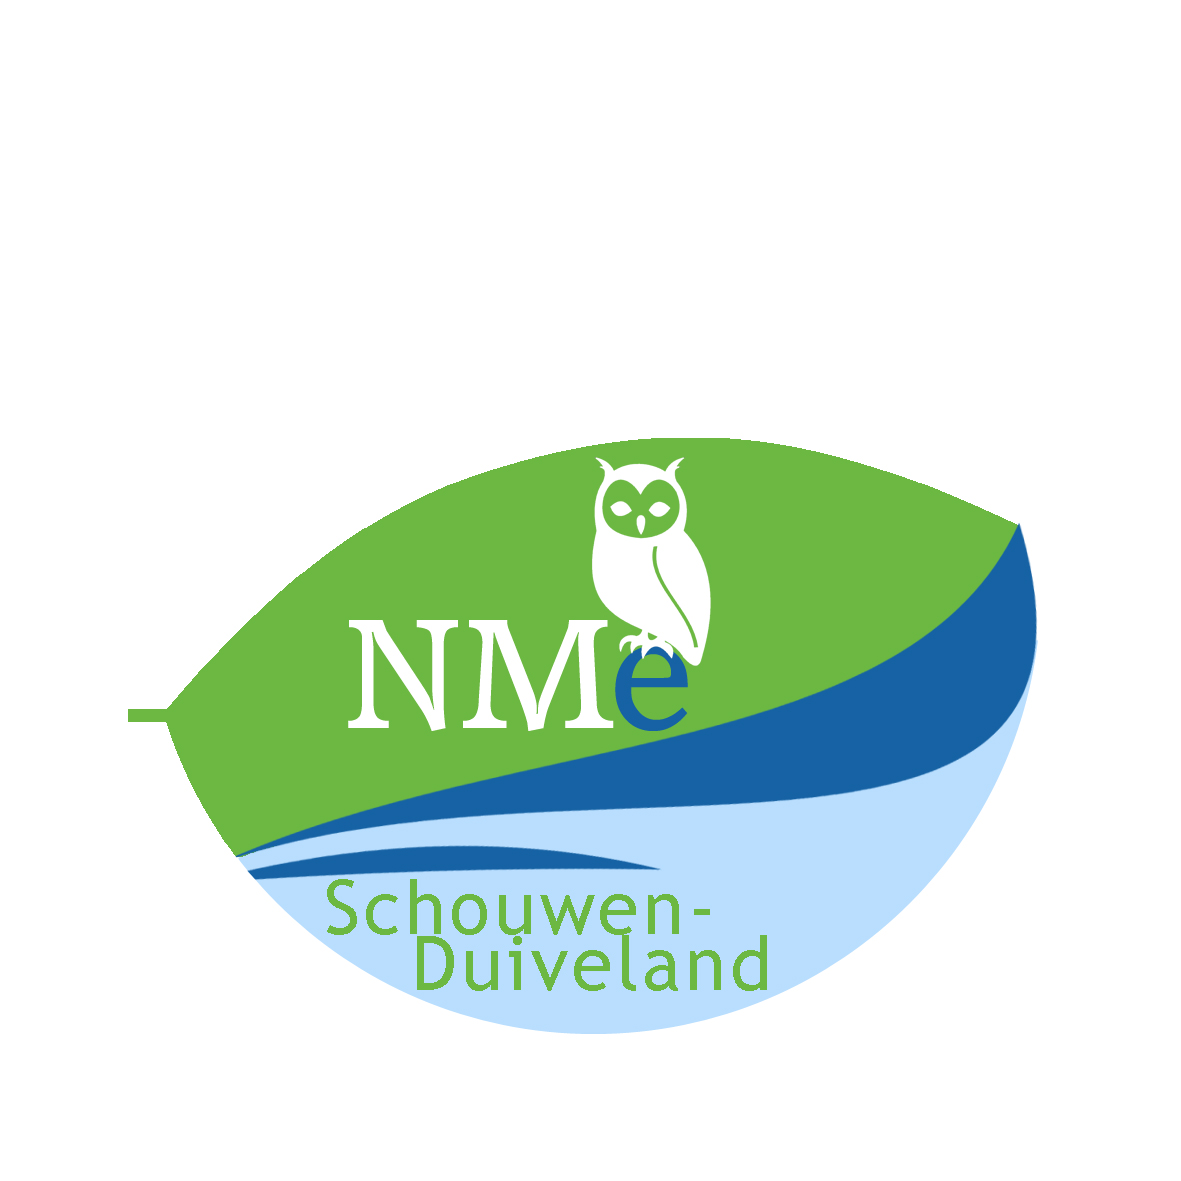 NME Schouwen- Duiveland